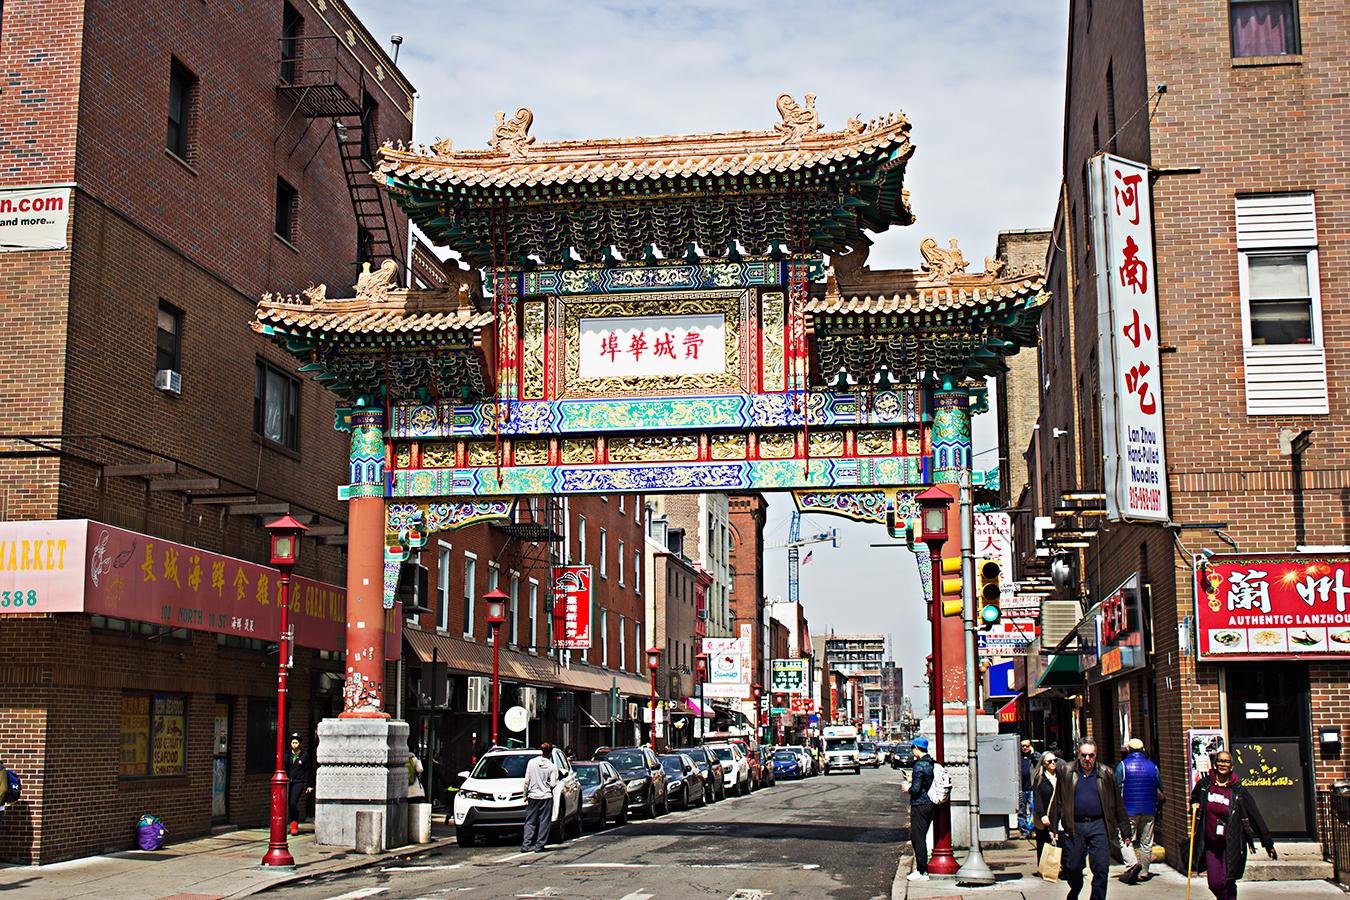 Fangyi_Fan_Philadelphia_Chinatown_Main_Entrance